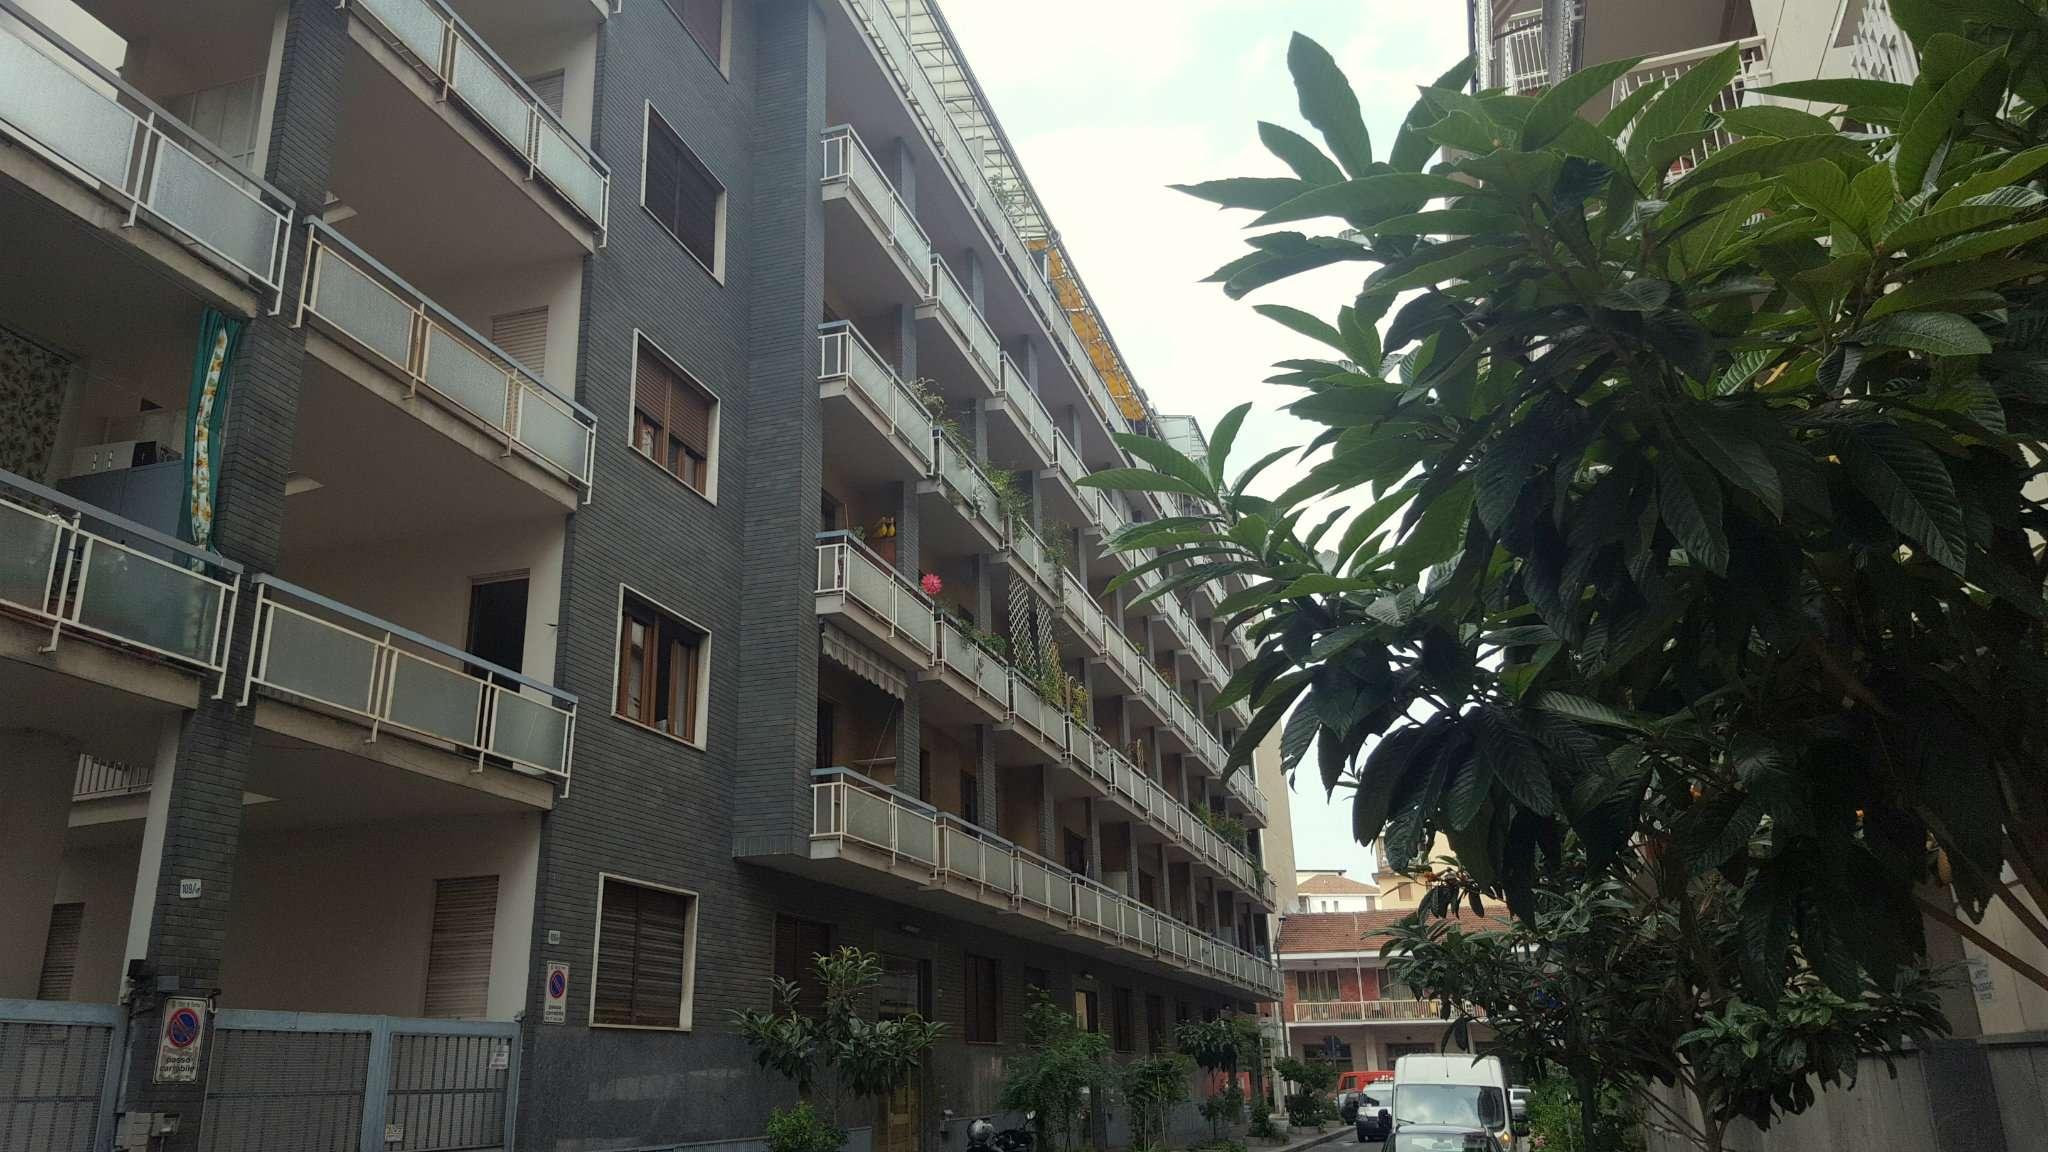 Appartamento in vendita Zona Santa Rita - via Barletta 109/6 Torino